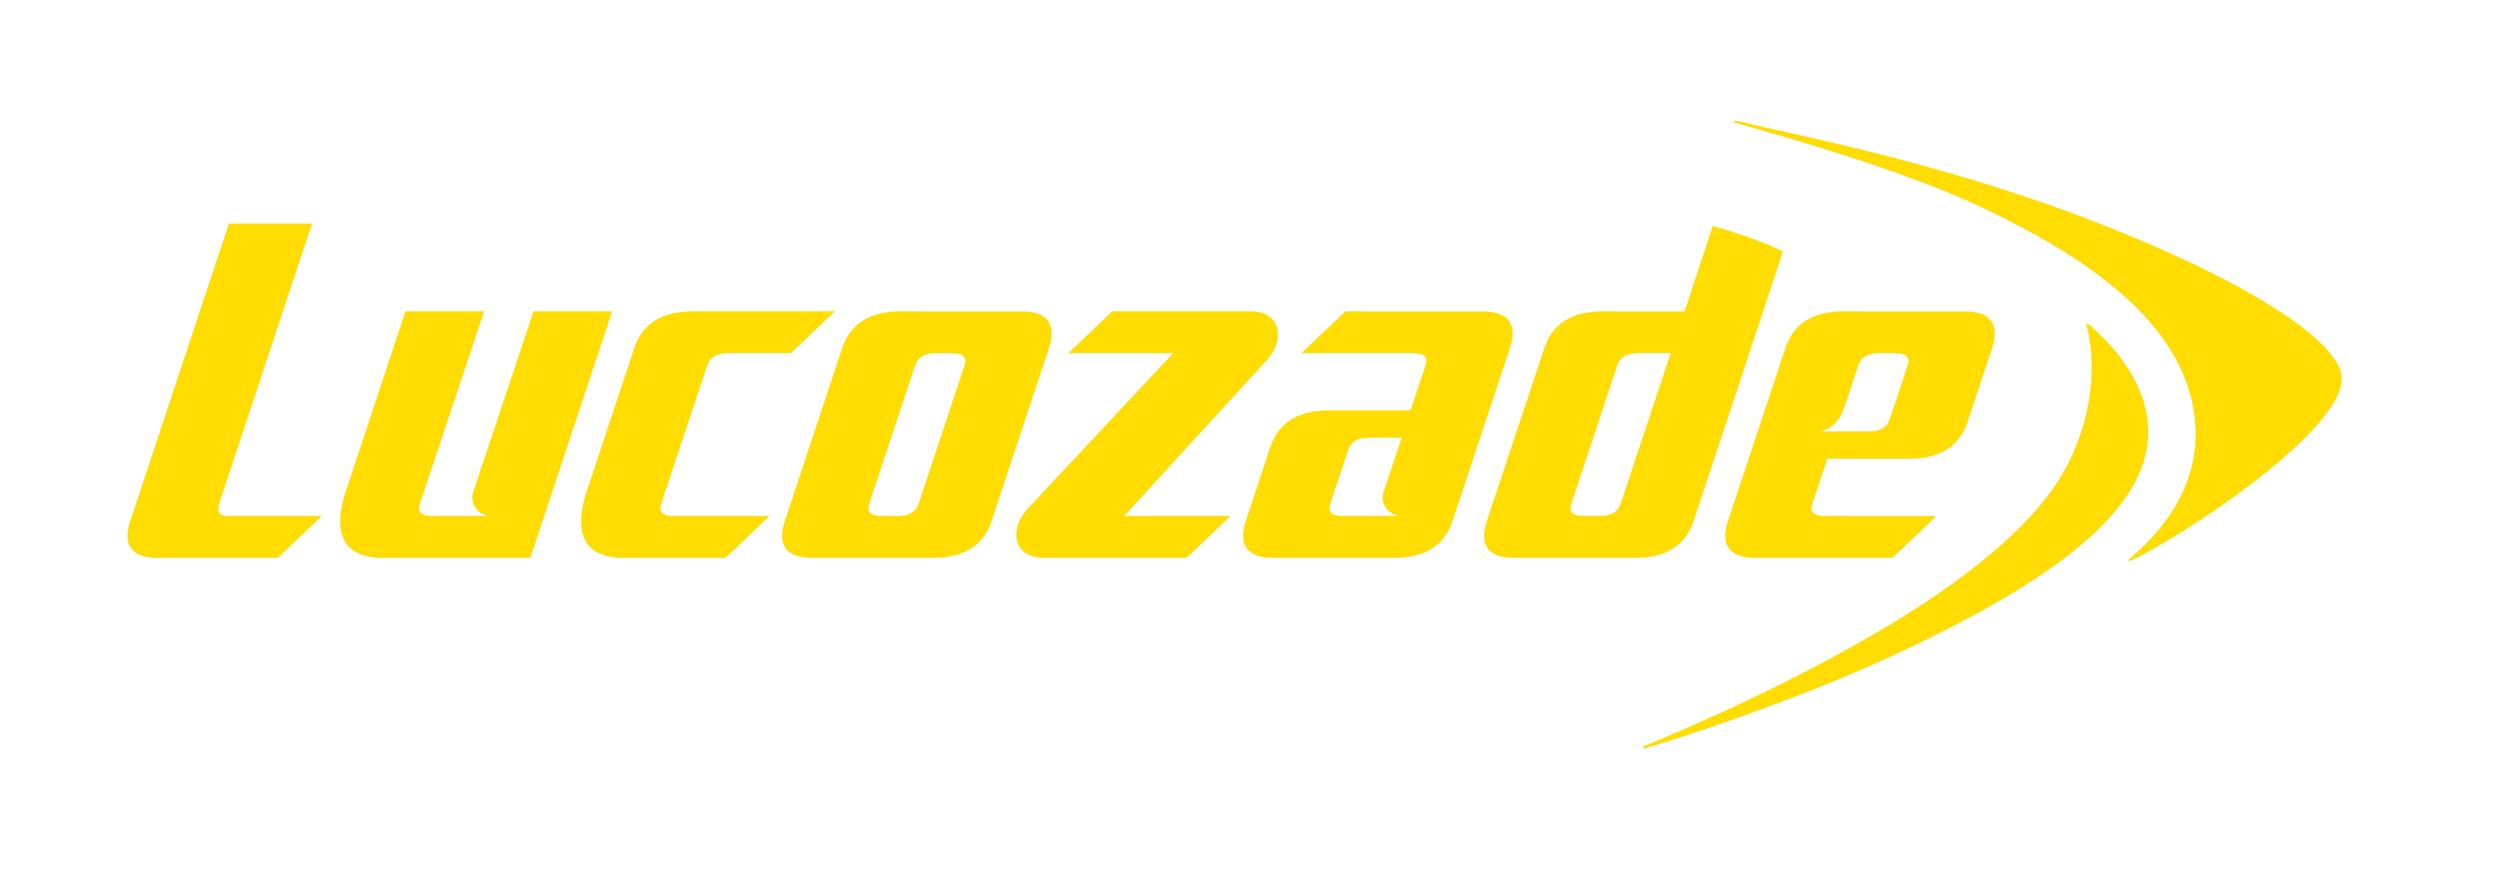 Lucozade_master_logo_yellow.jpg